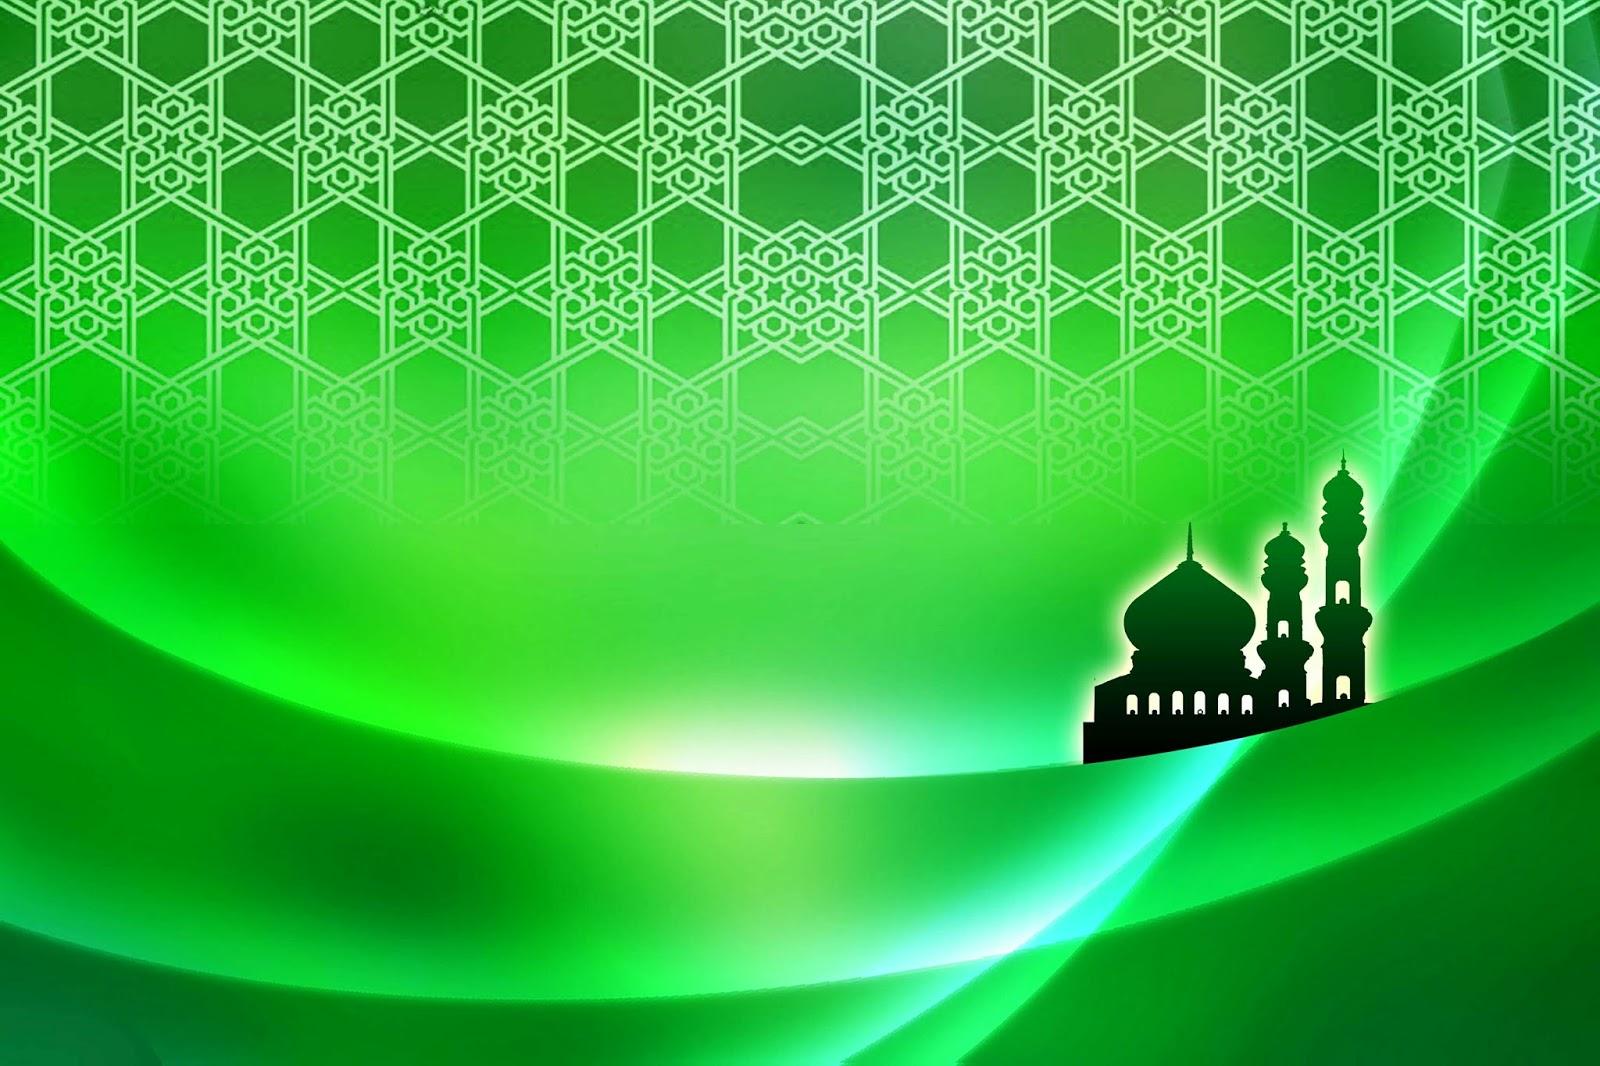 background islami hd hijau